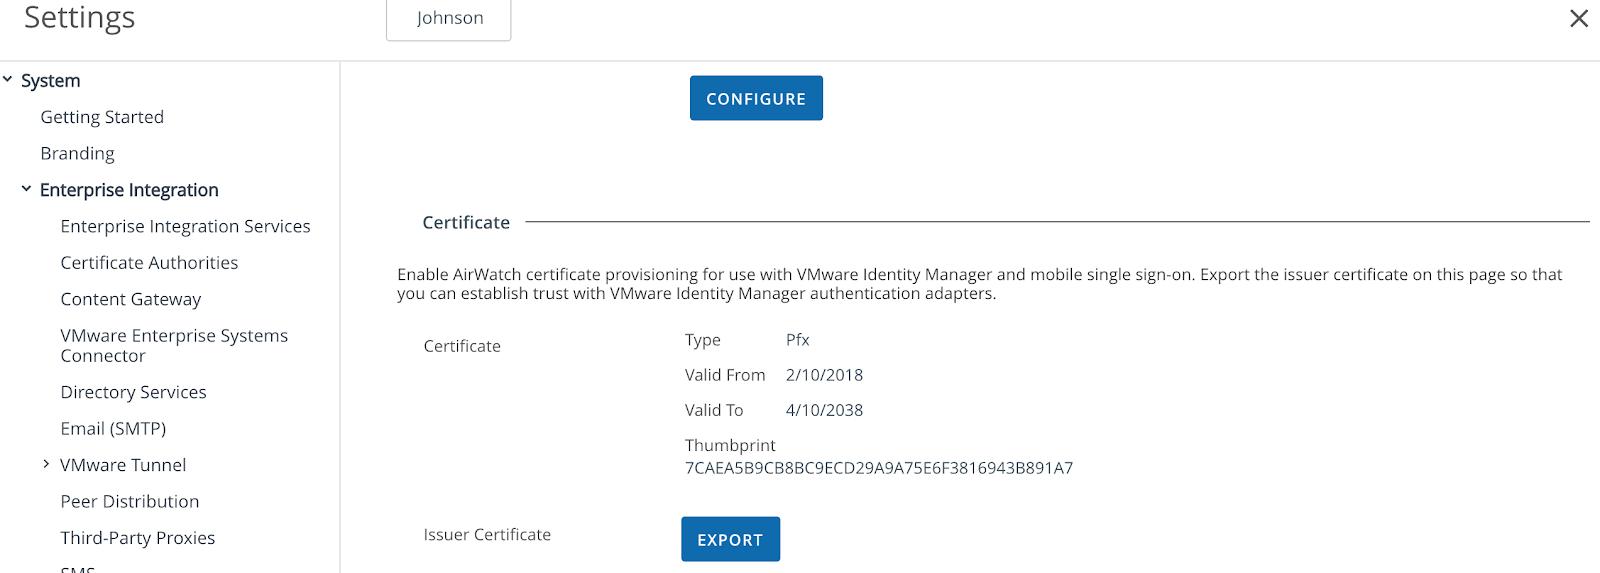 sso configuring ios airwatch certificate gooder even